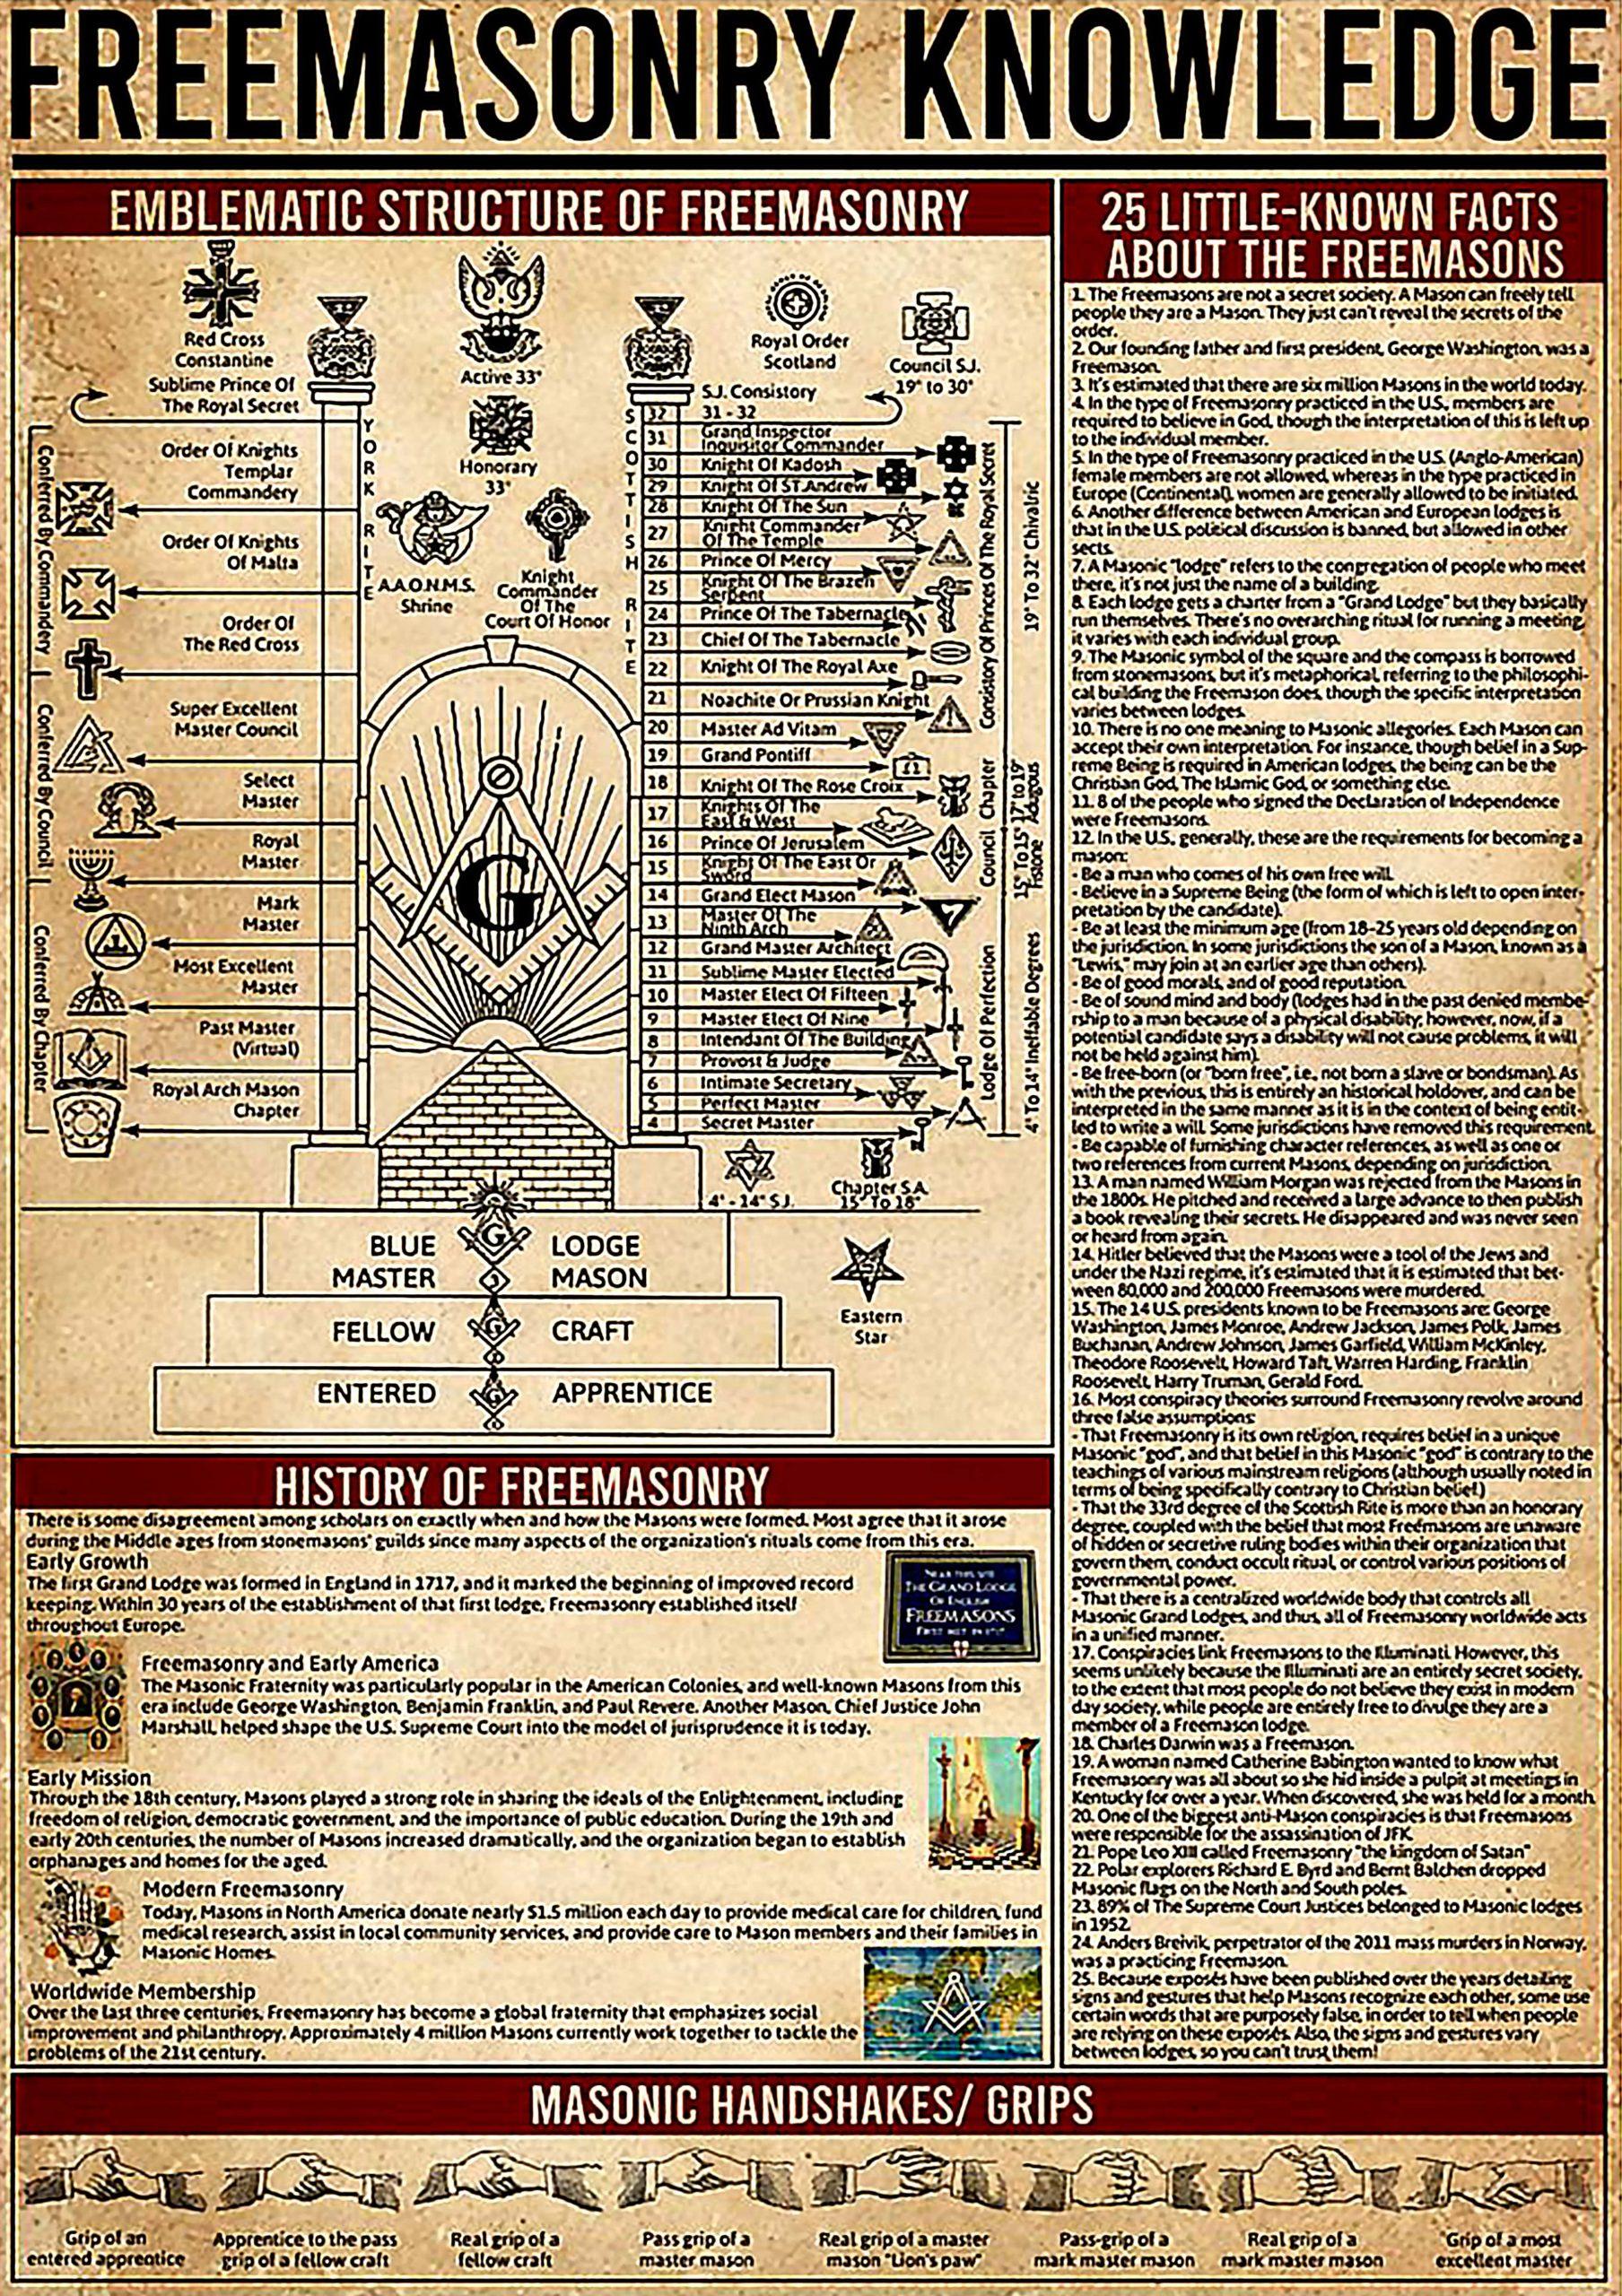 vintage freemasonry knowledge poster 1